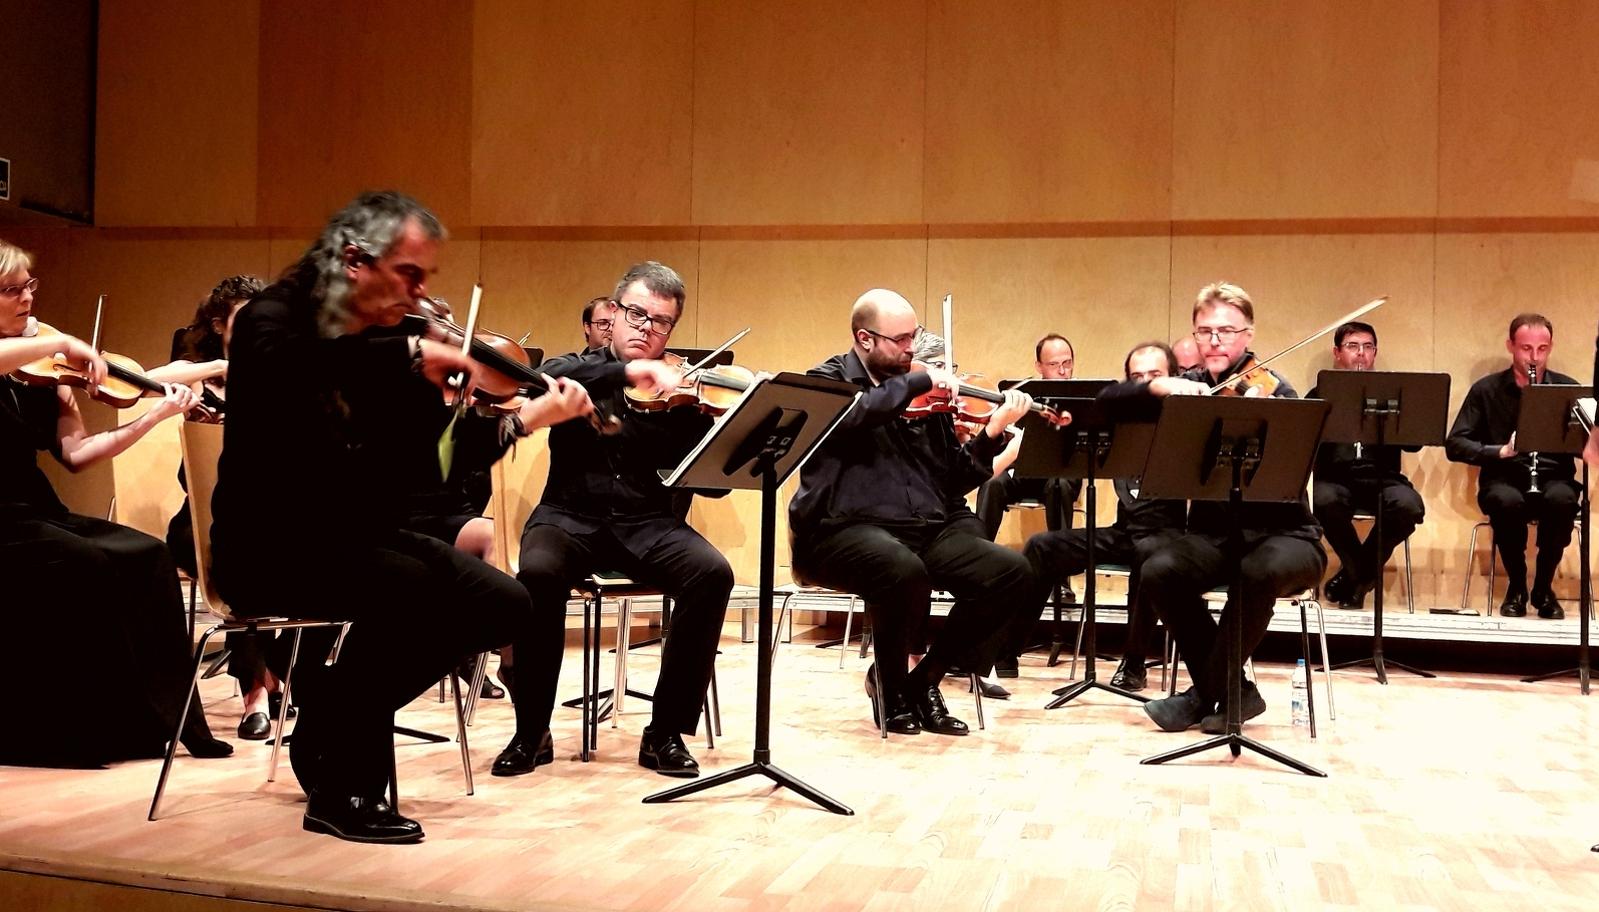 L'Orquestra de Cambra Terrassa 48